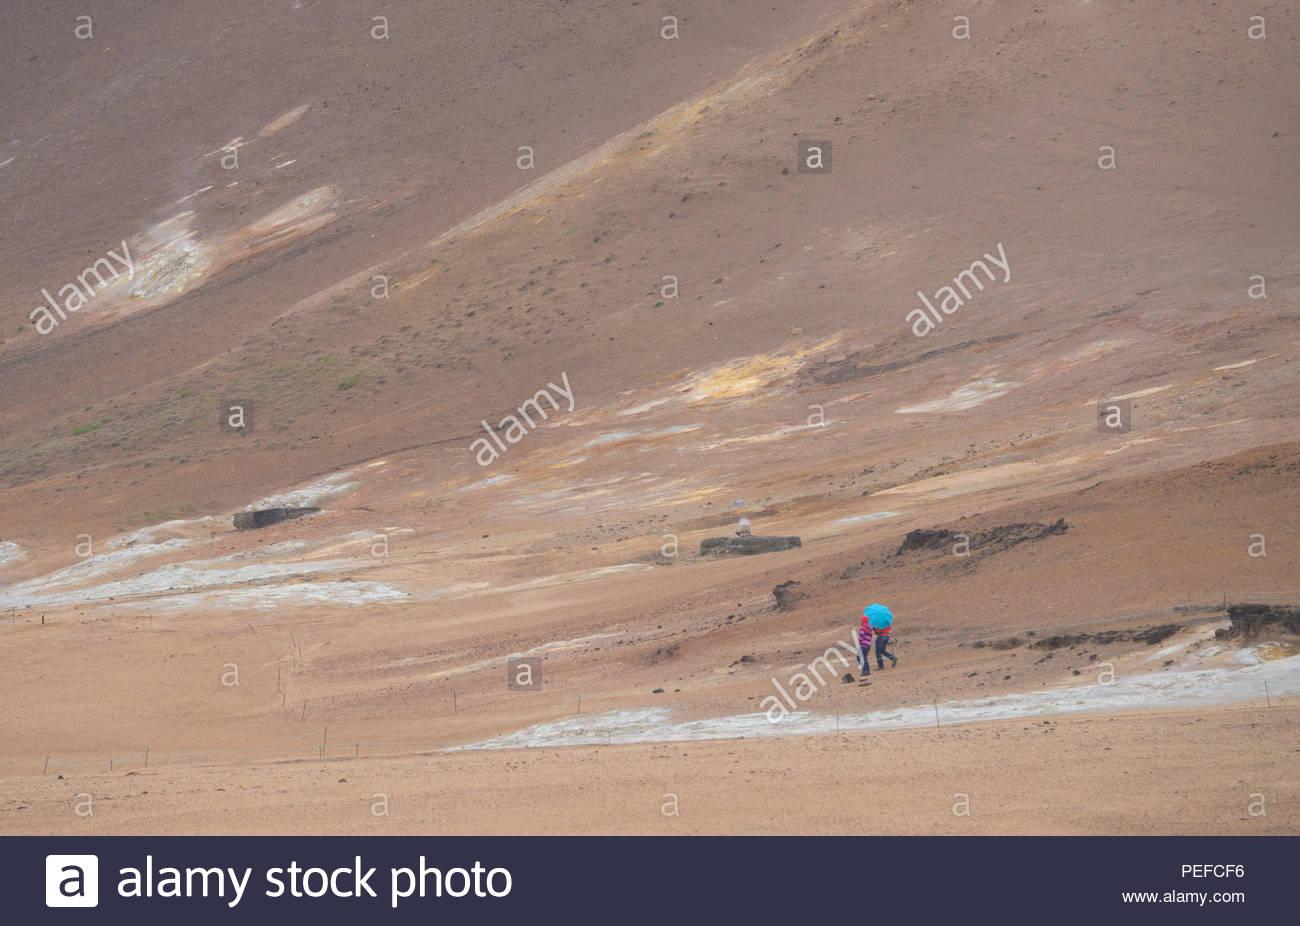 Tourists at the Hverarond mud pots. Stock Photo